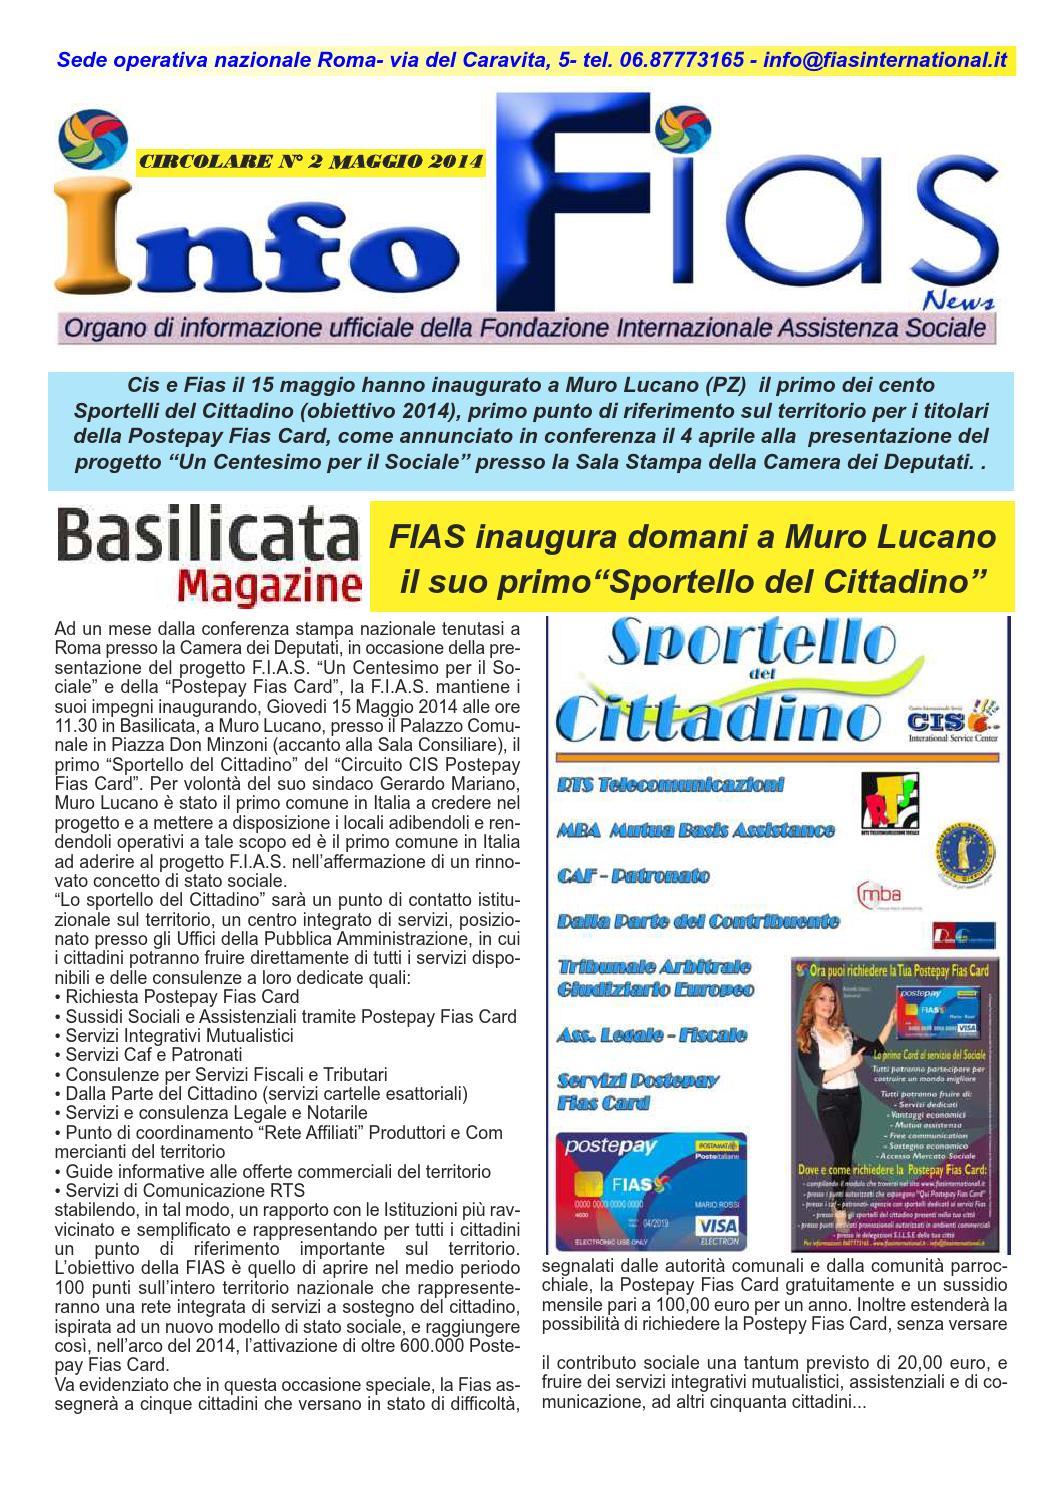 Info fias n 2 maggio rassegna stampa by rocco milano issuu for Camera deputati rassegna stampa